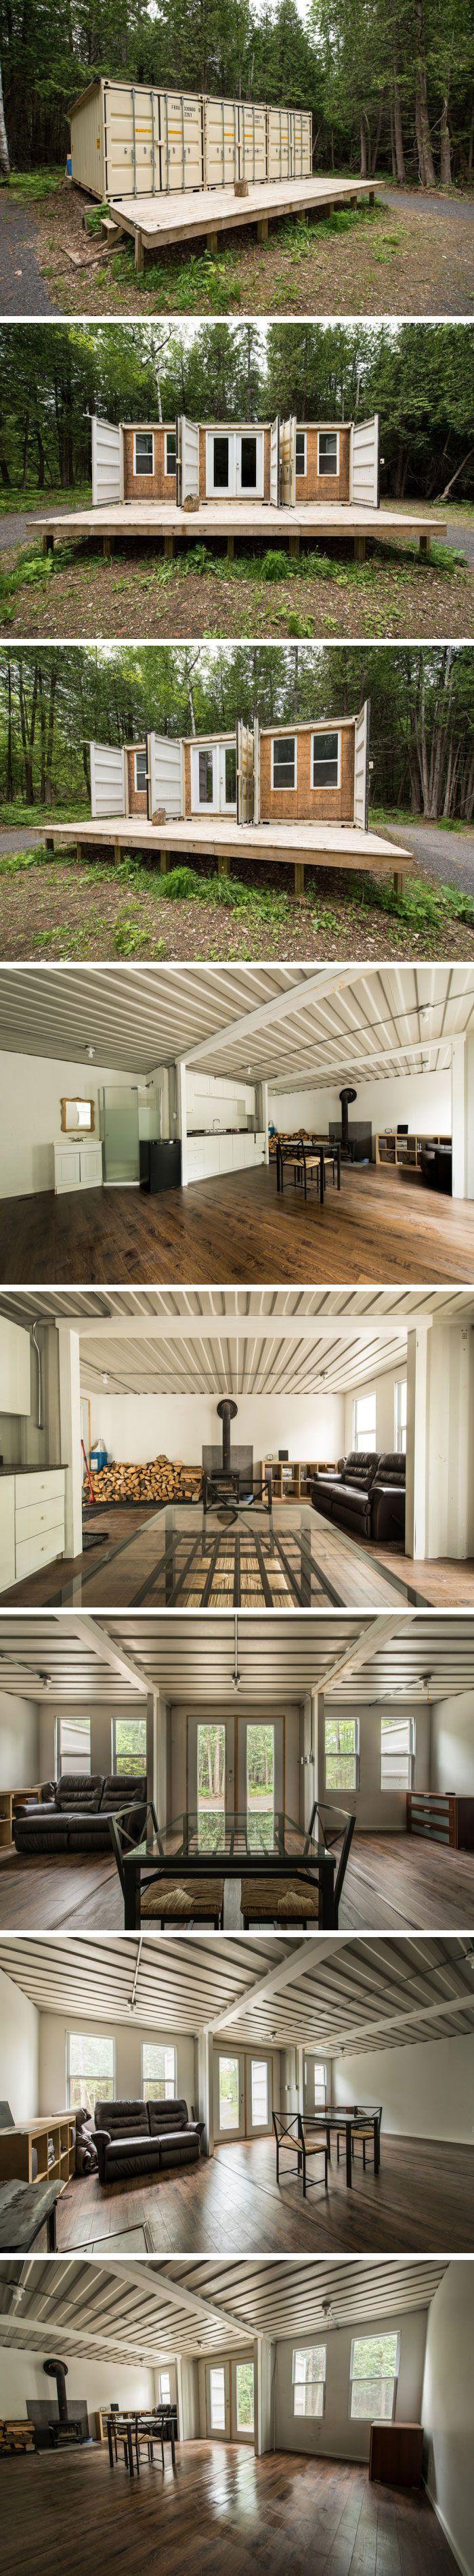 #woodburningheater #refurbished #storagecontainer